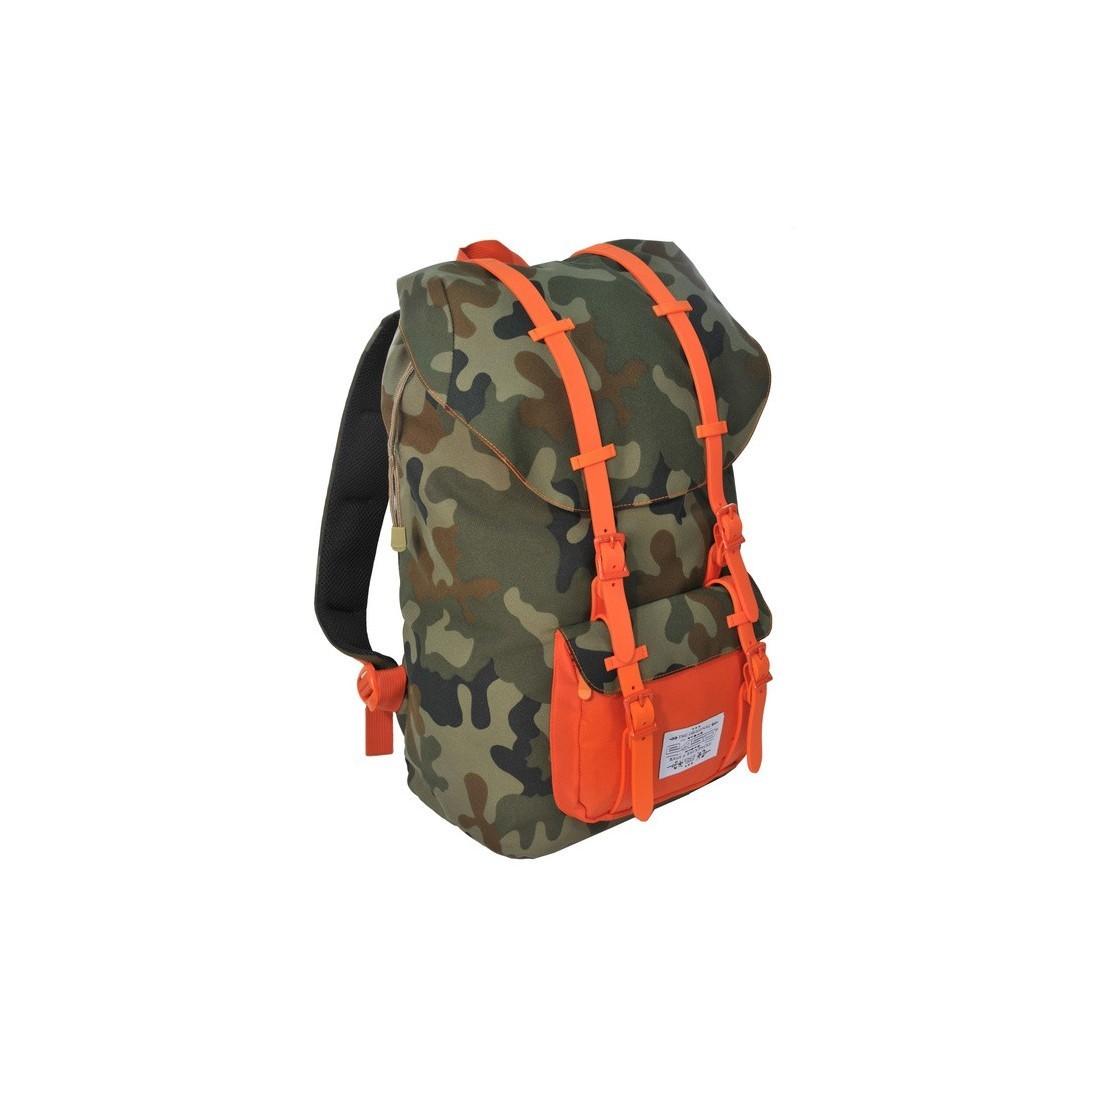 Plecak Premium Moro pomarańczowy - plecak-tornister.pl